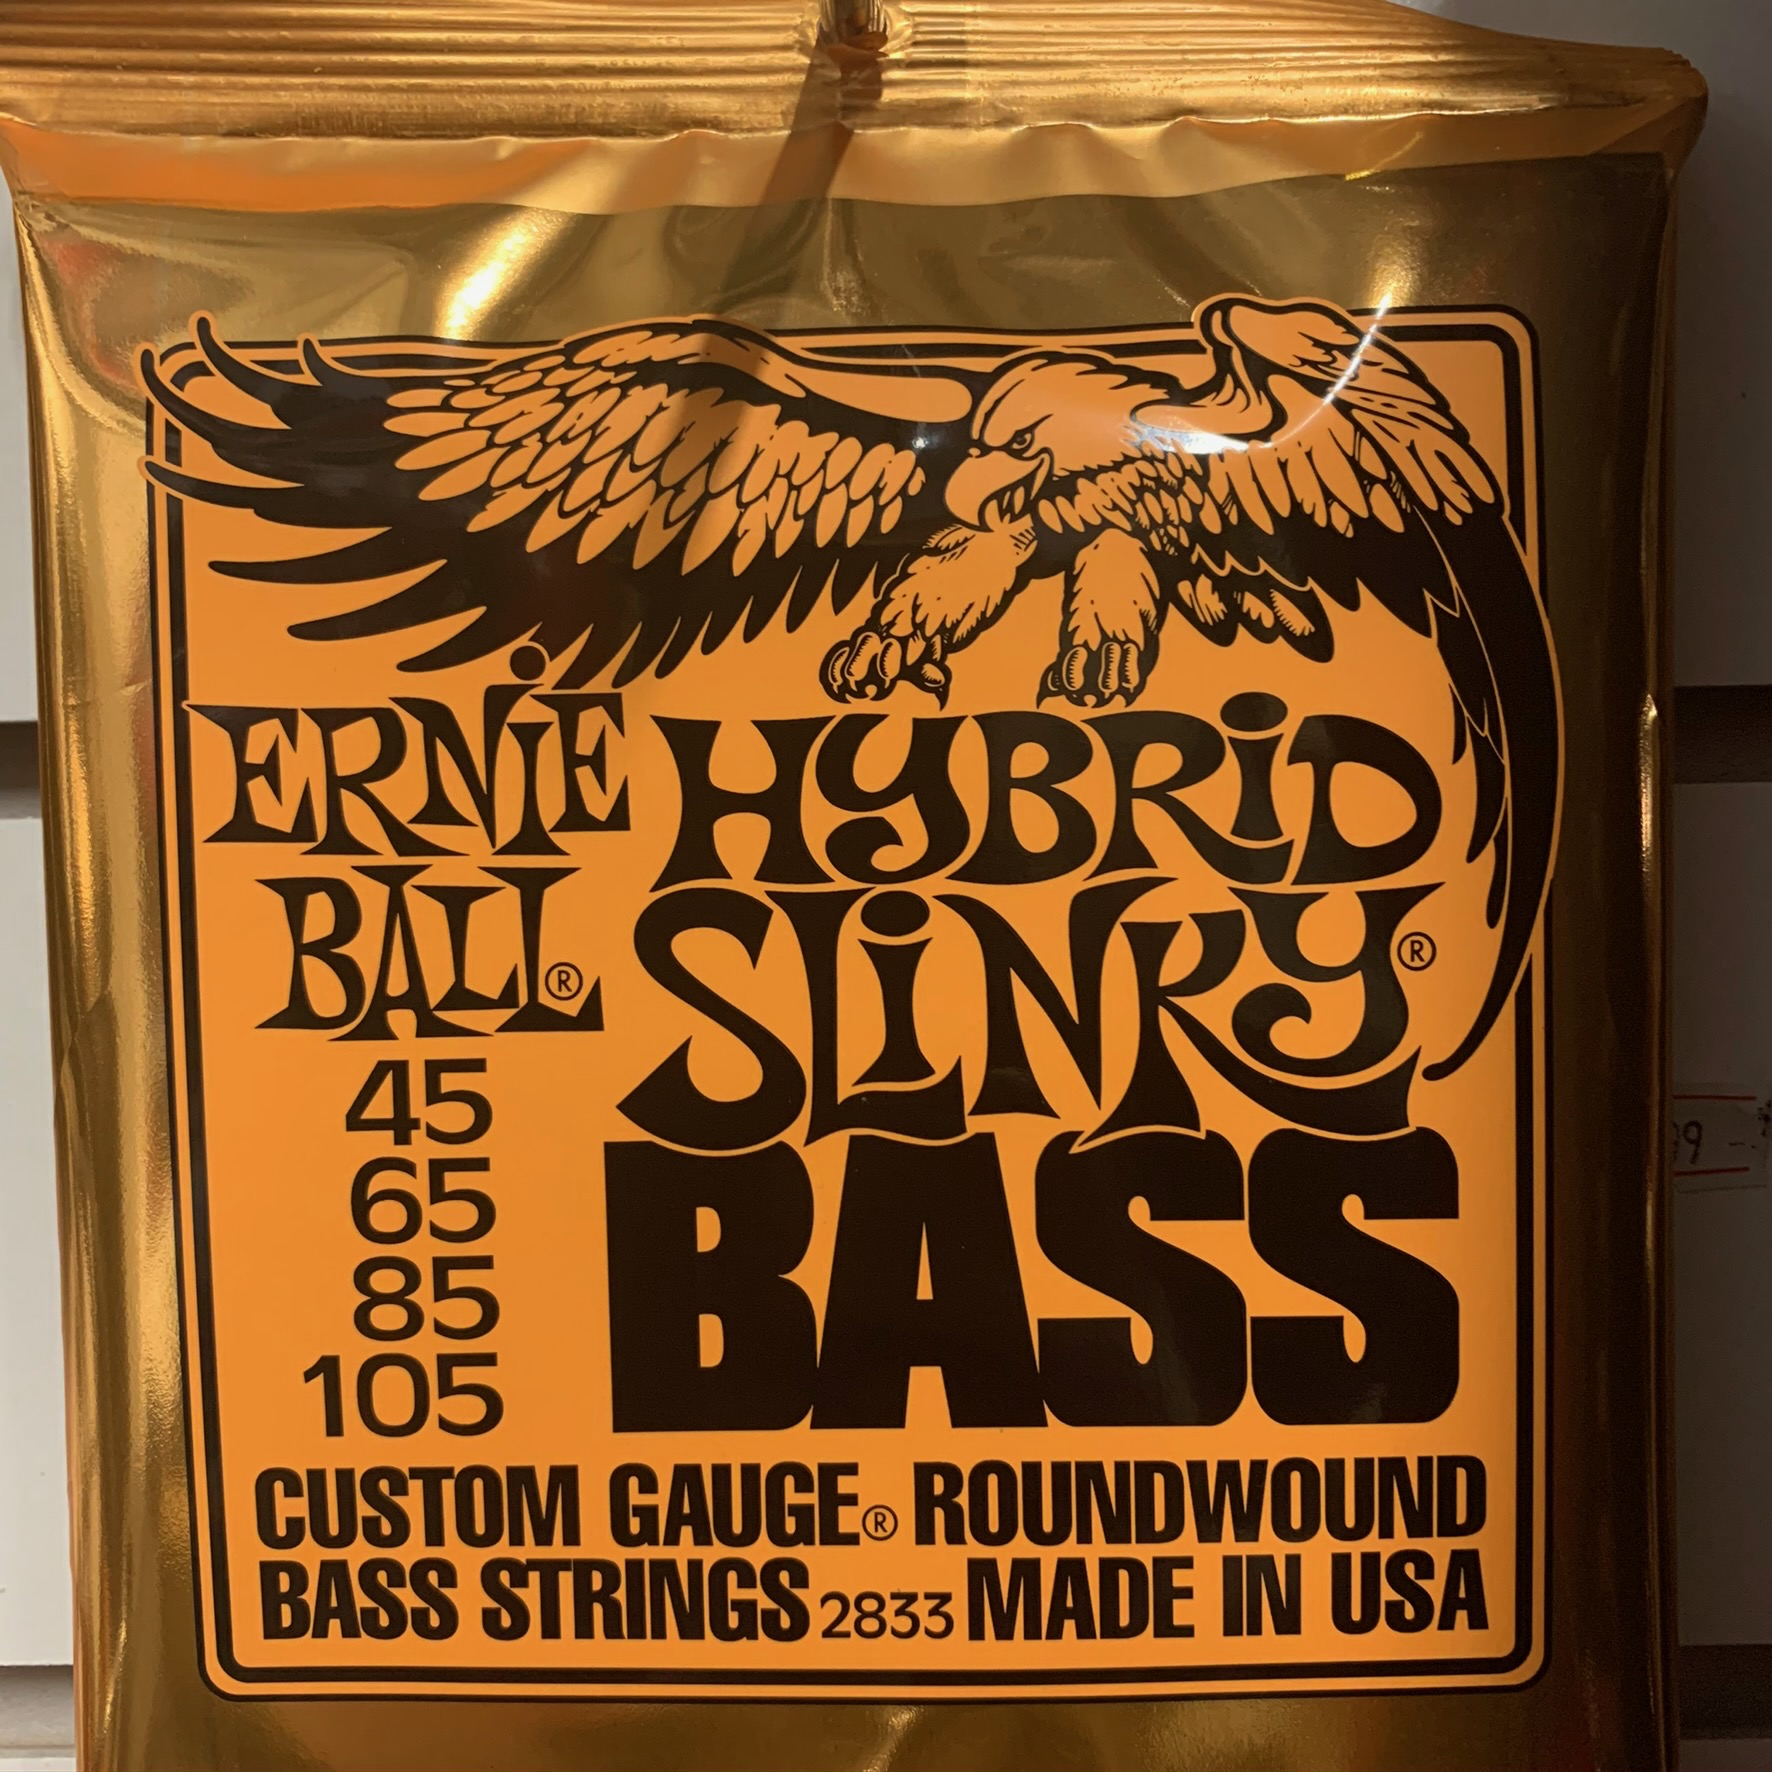 EB HYBRID SLINKY BASS 45 - 105